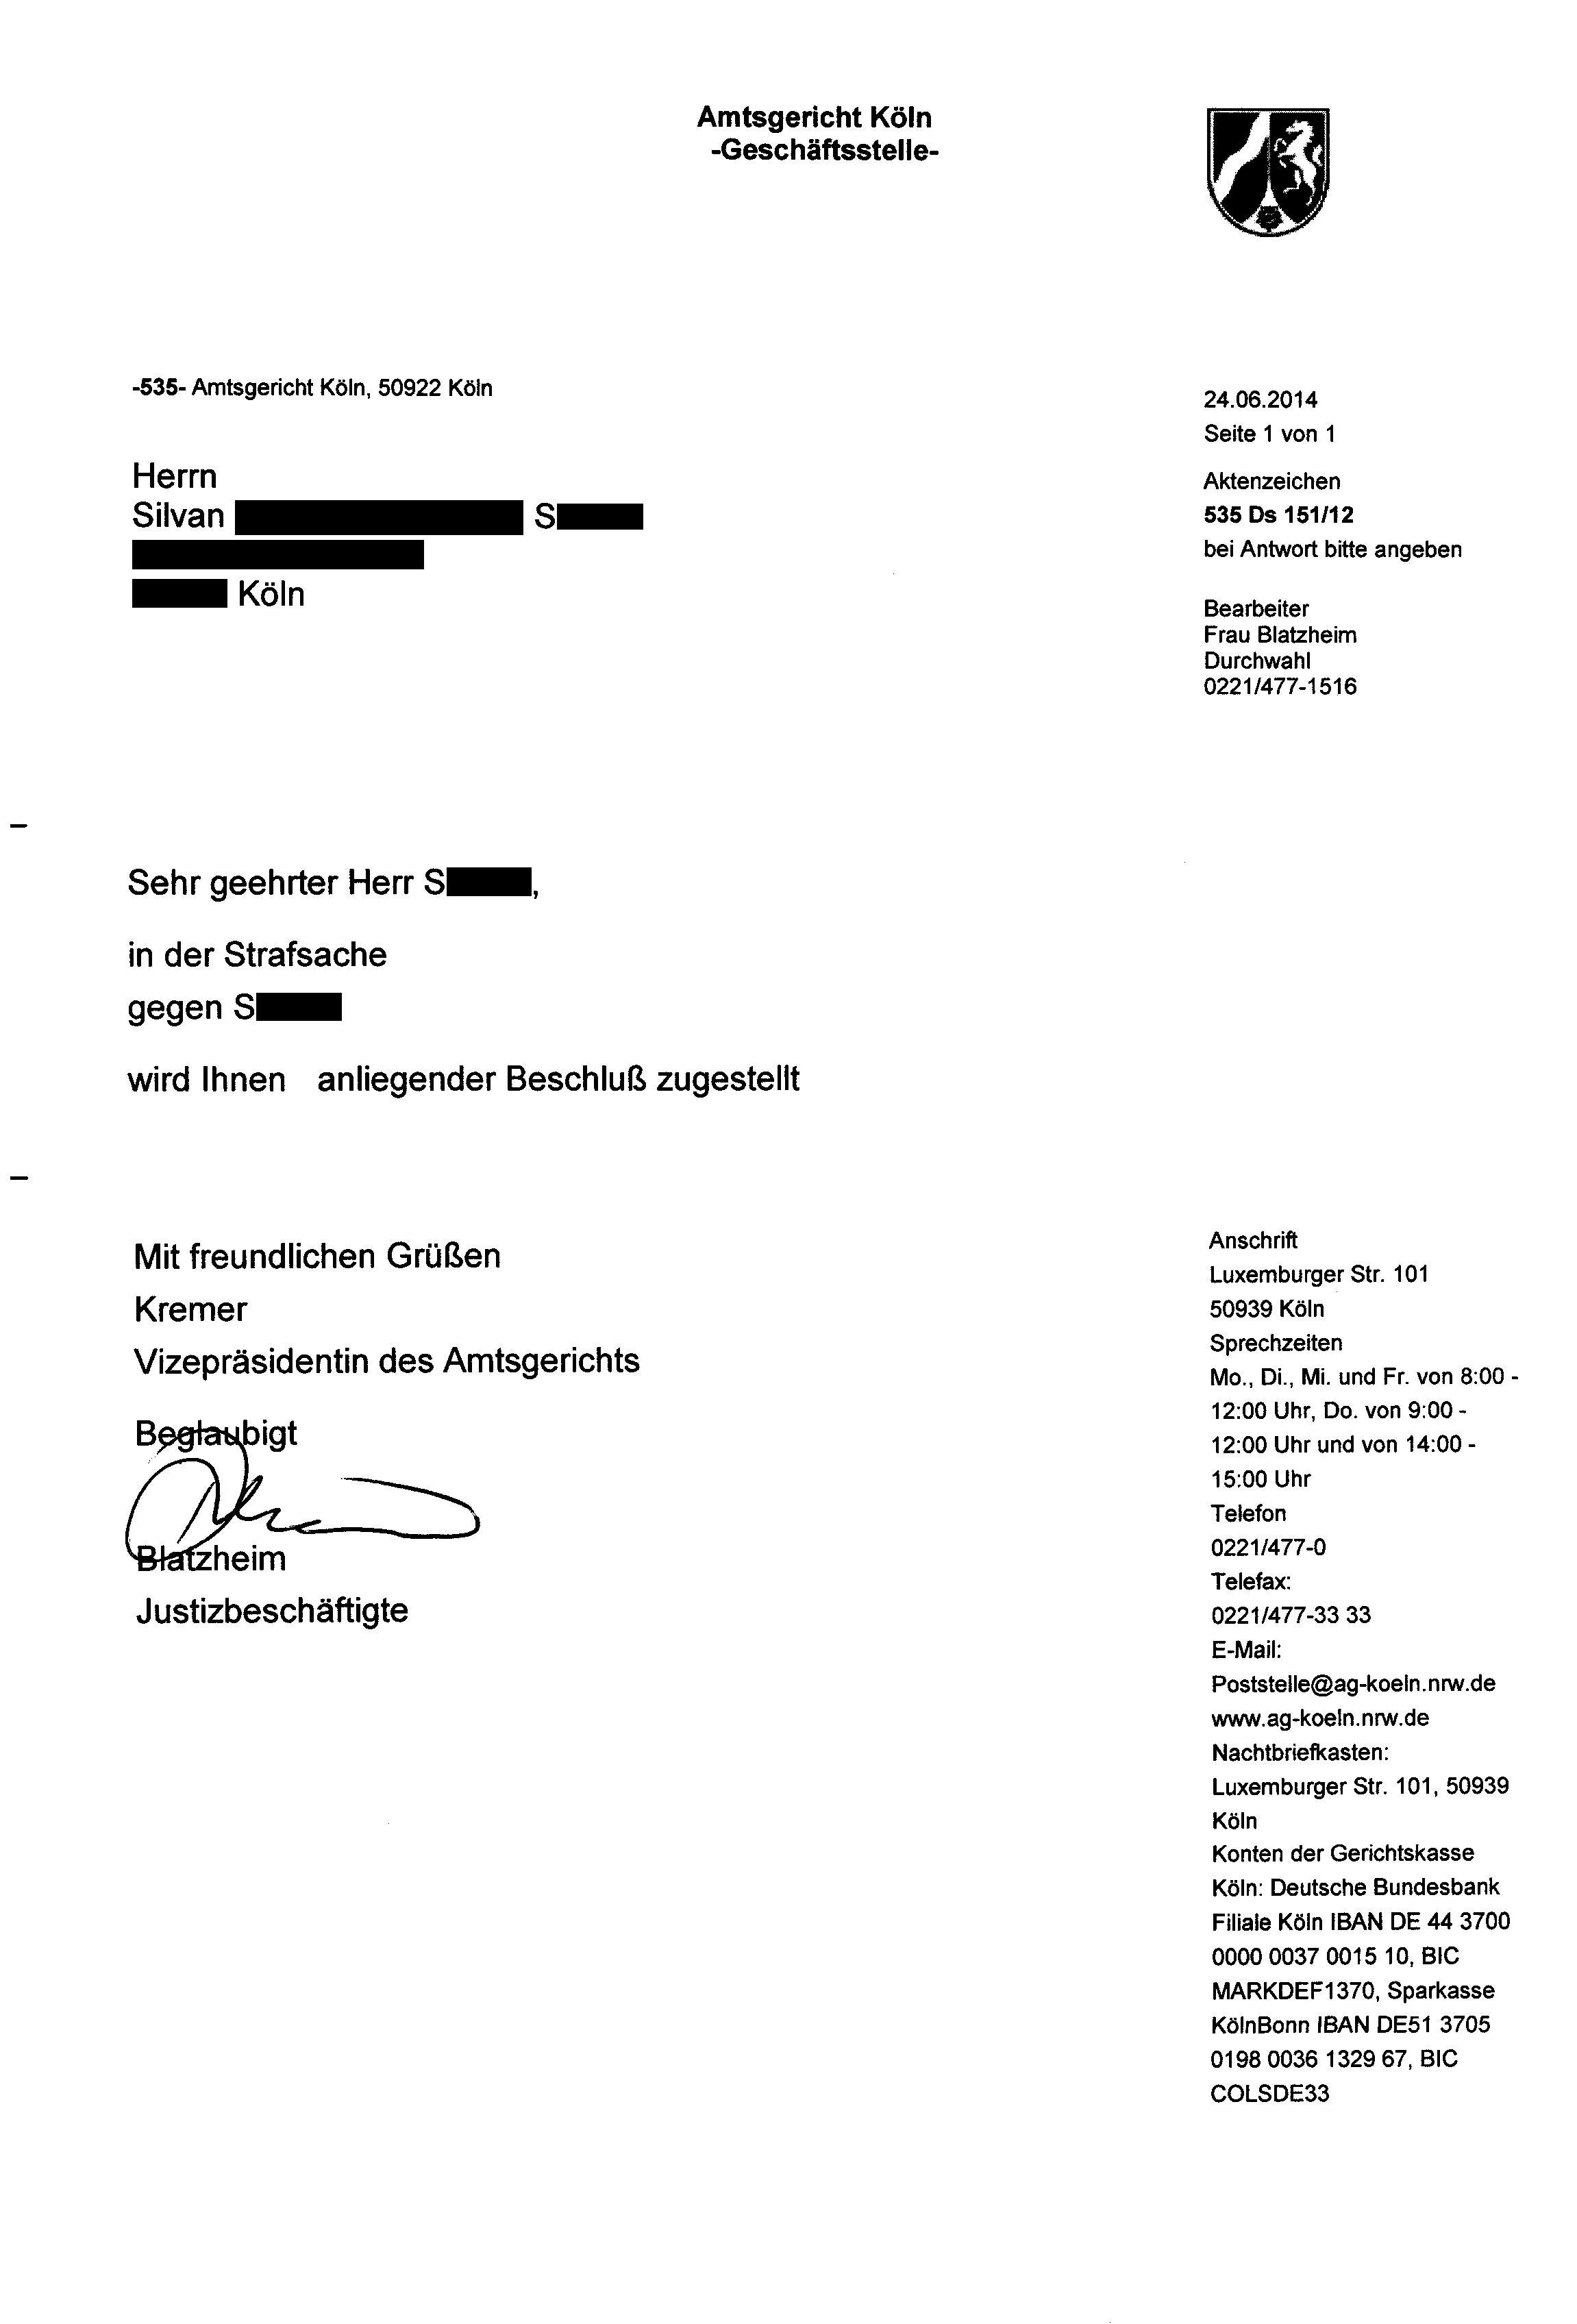 Nazi Vizepräsidentin Heike Kremer der Firma Amtsgericht Köln noch